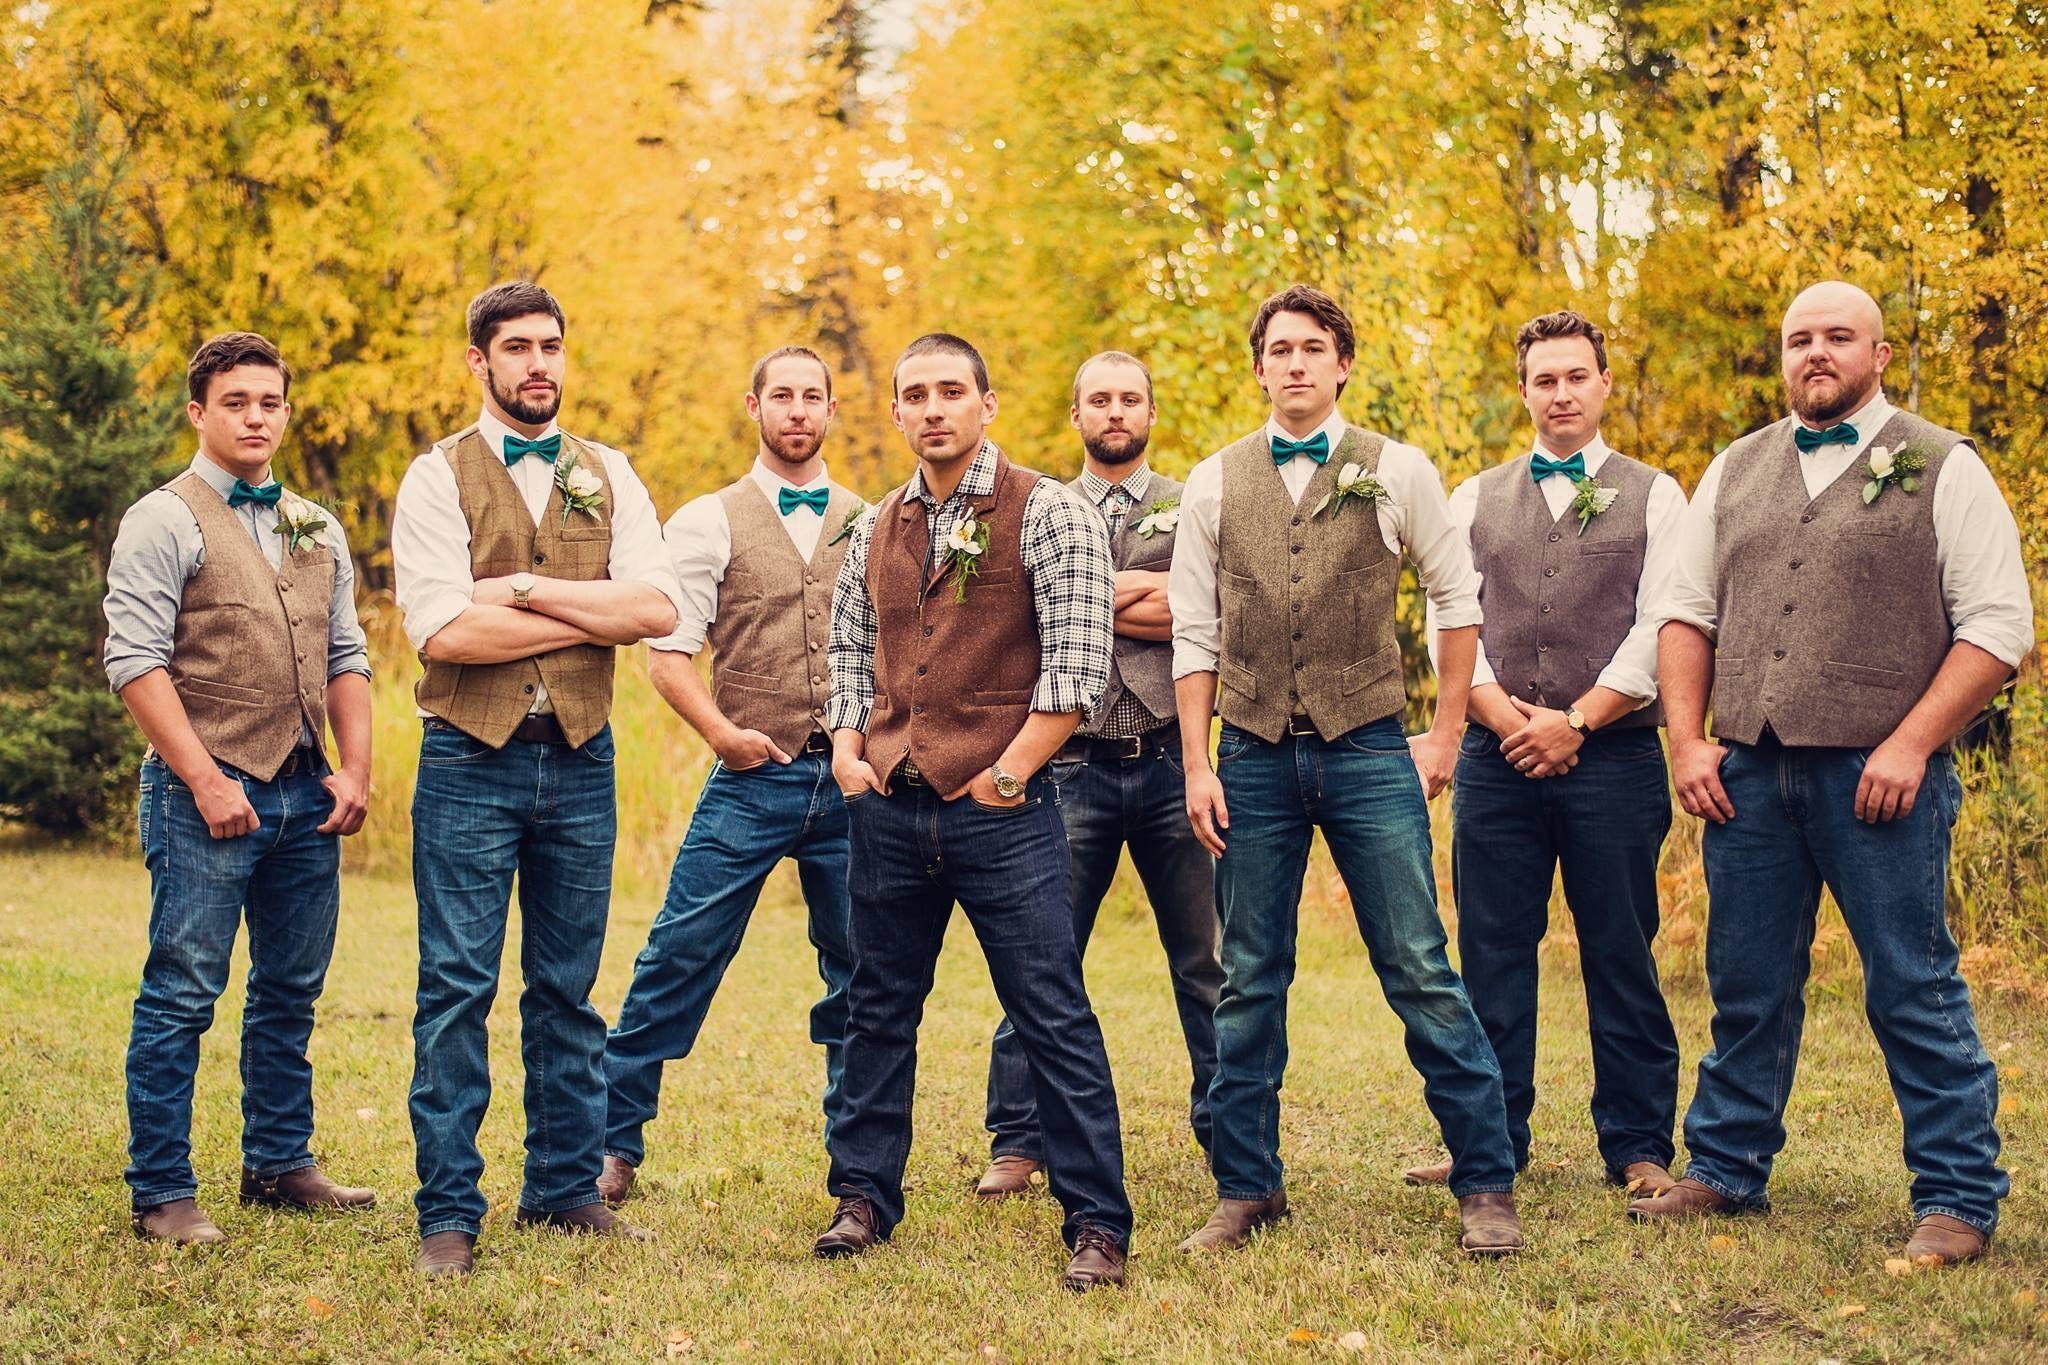 Wedding Inspiration Fall Vintage Rustic Groomsmen